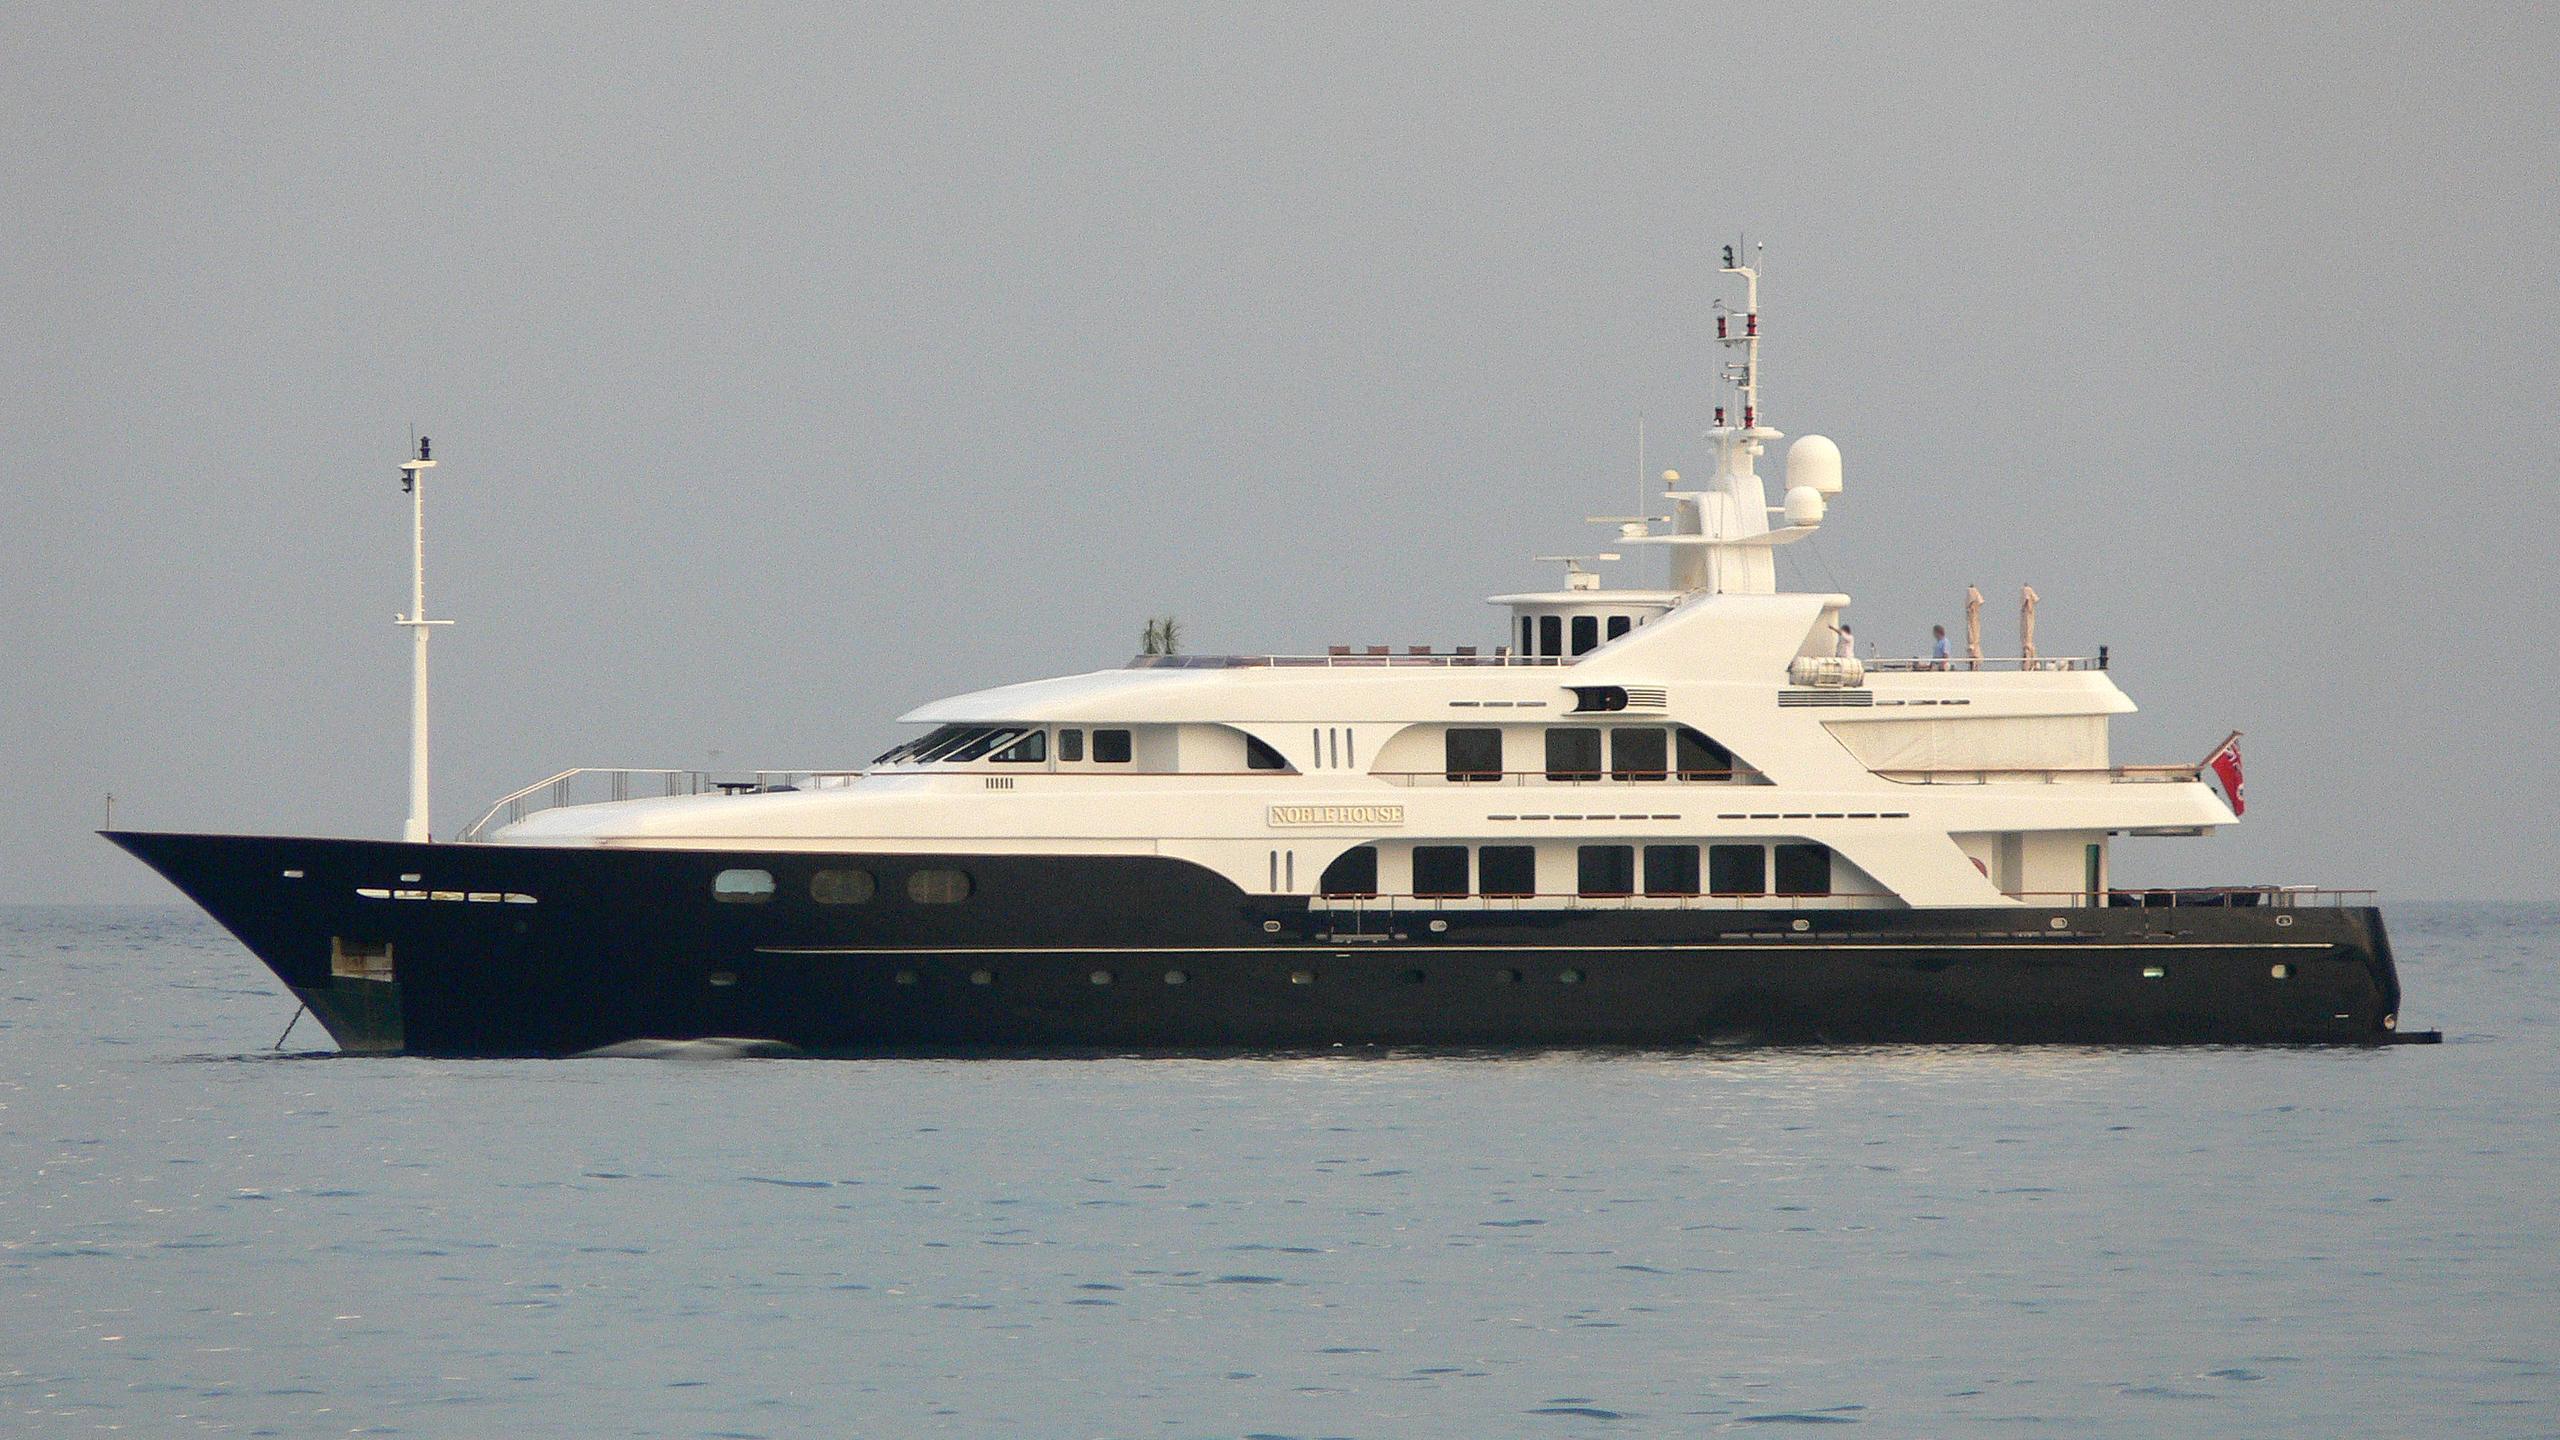 noble-house-motor-yacht-sensation-2006-53m--half-profile